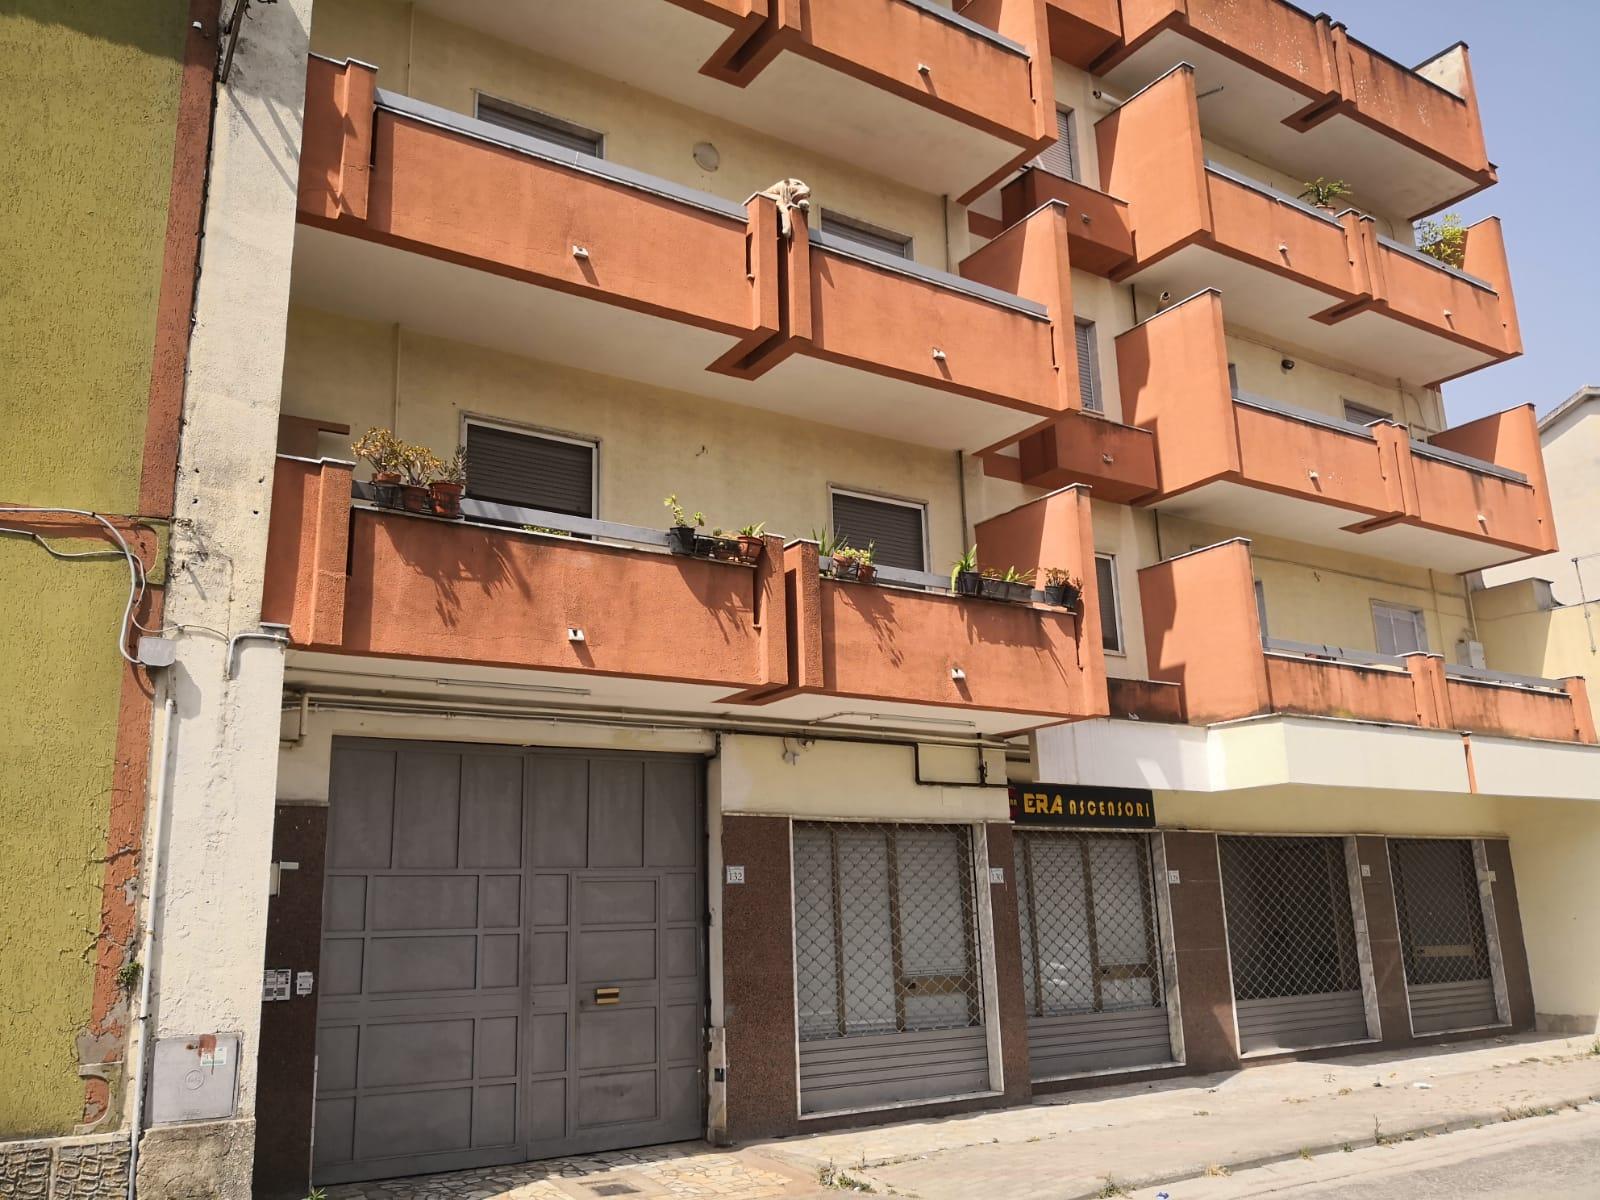 Fittasi San Nicola La Strada via Gentile Appartamento con box